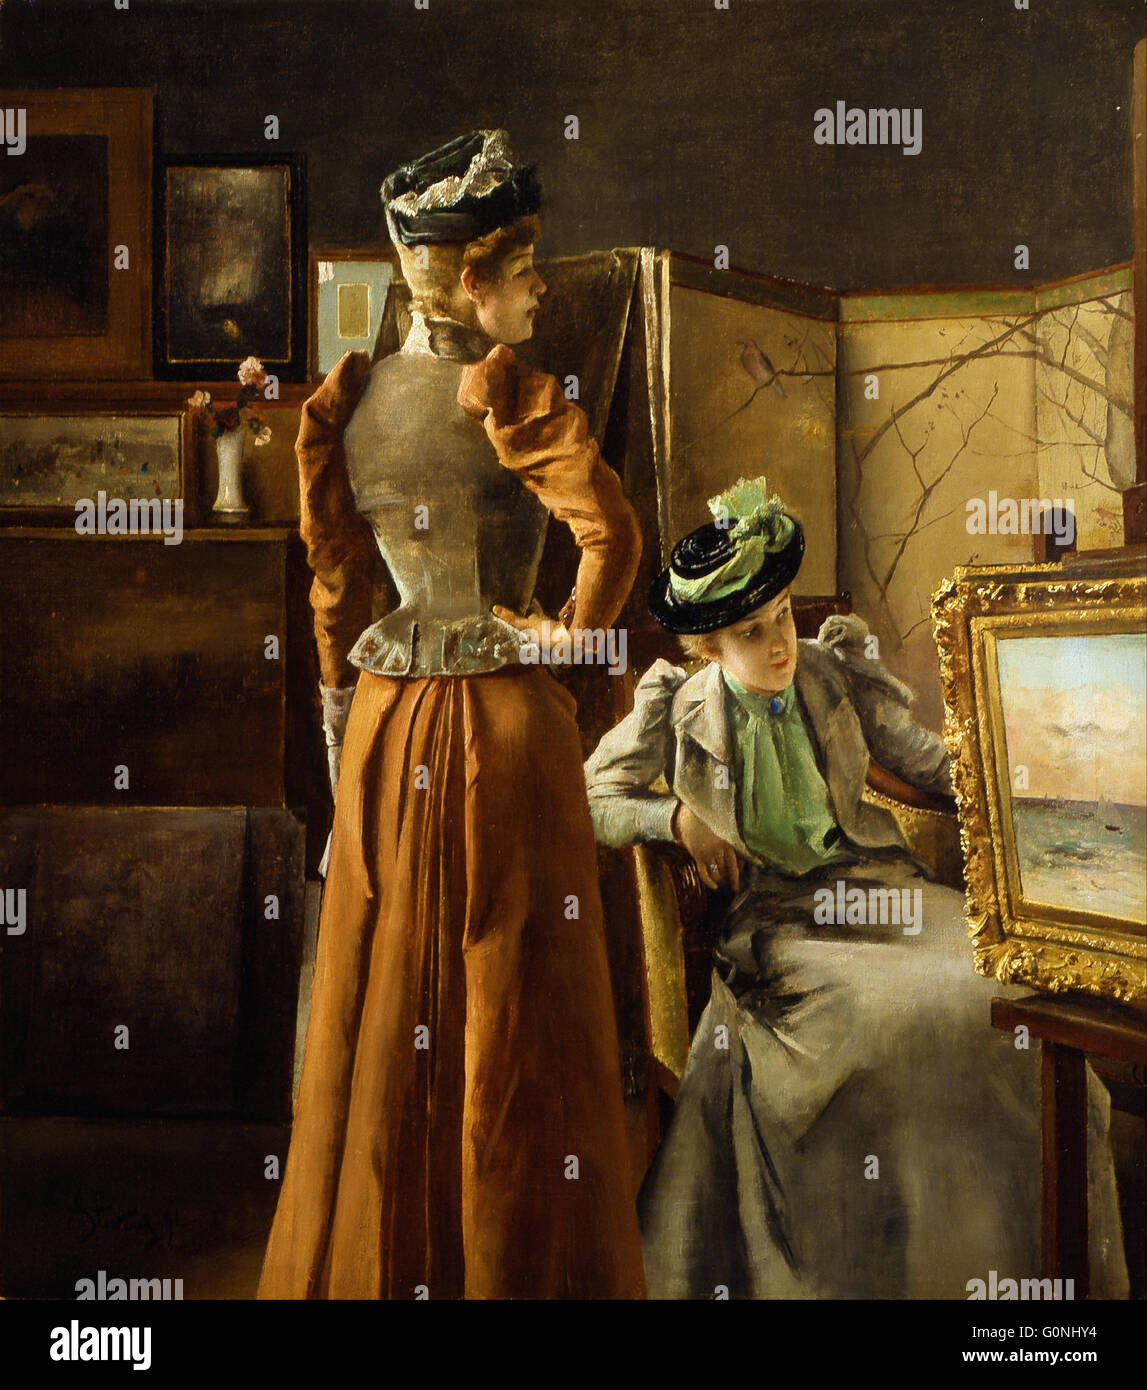 Stevens, Alfred Emile Leopold Joseph Victor - Visit to the Studio - Stock Image